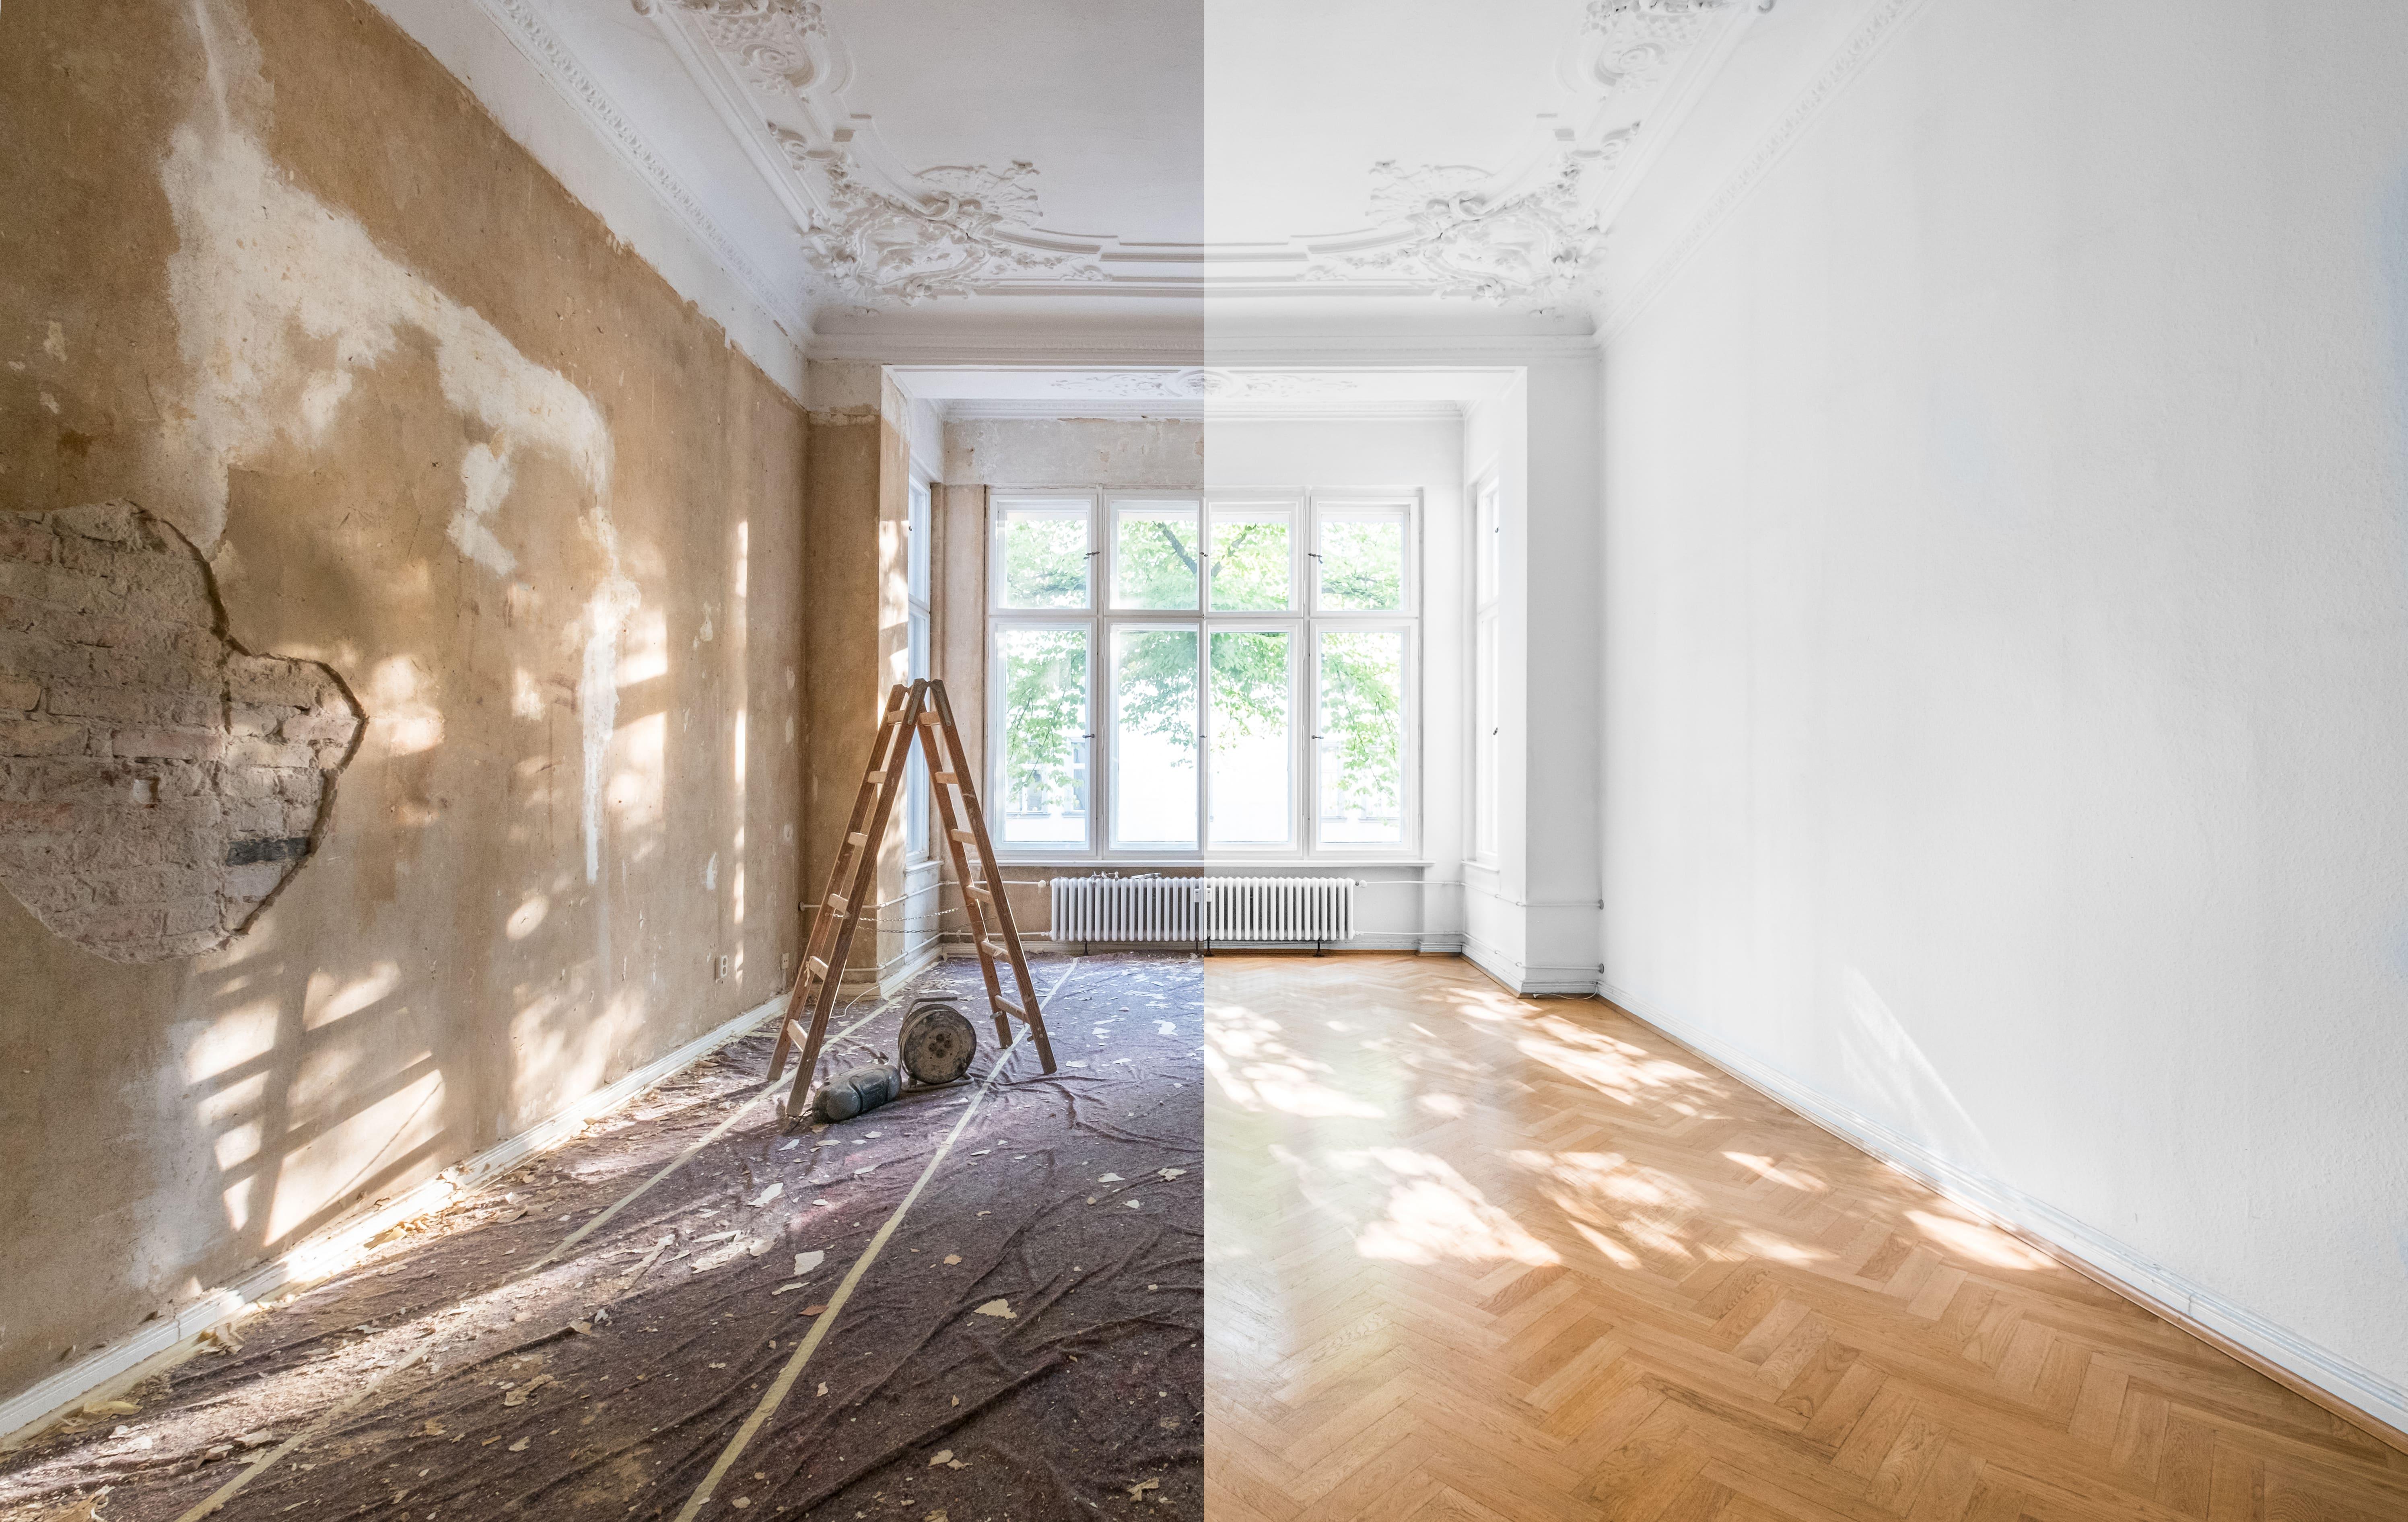 Restoration Reconstruction